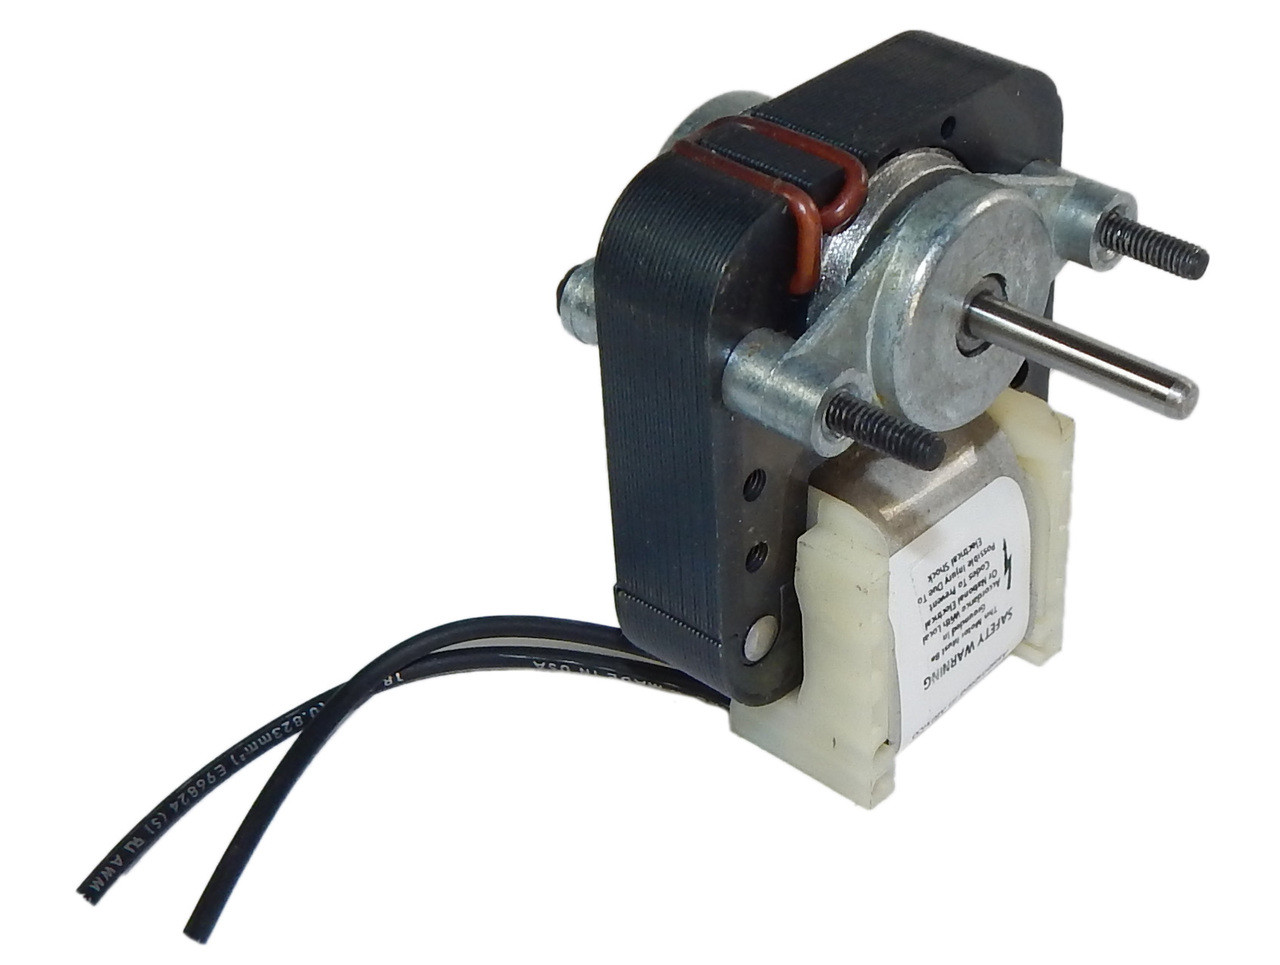 hight resolution of ventilation fan motor wiring diagram in